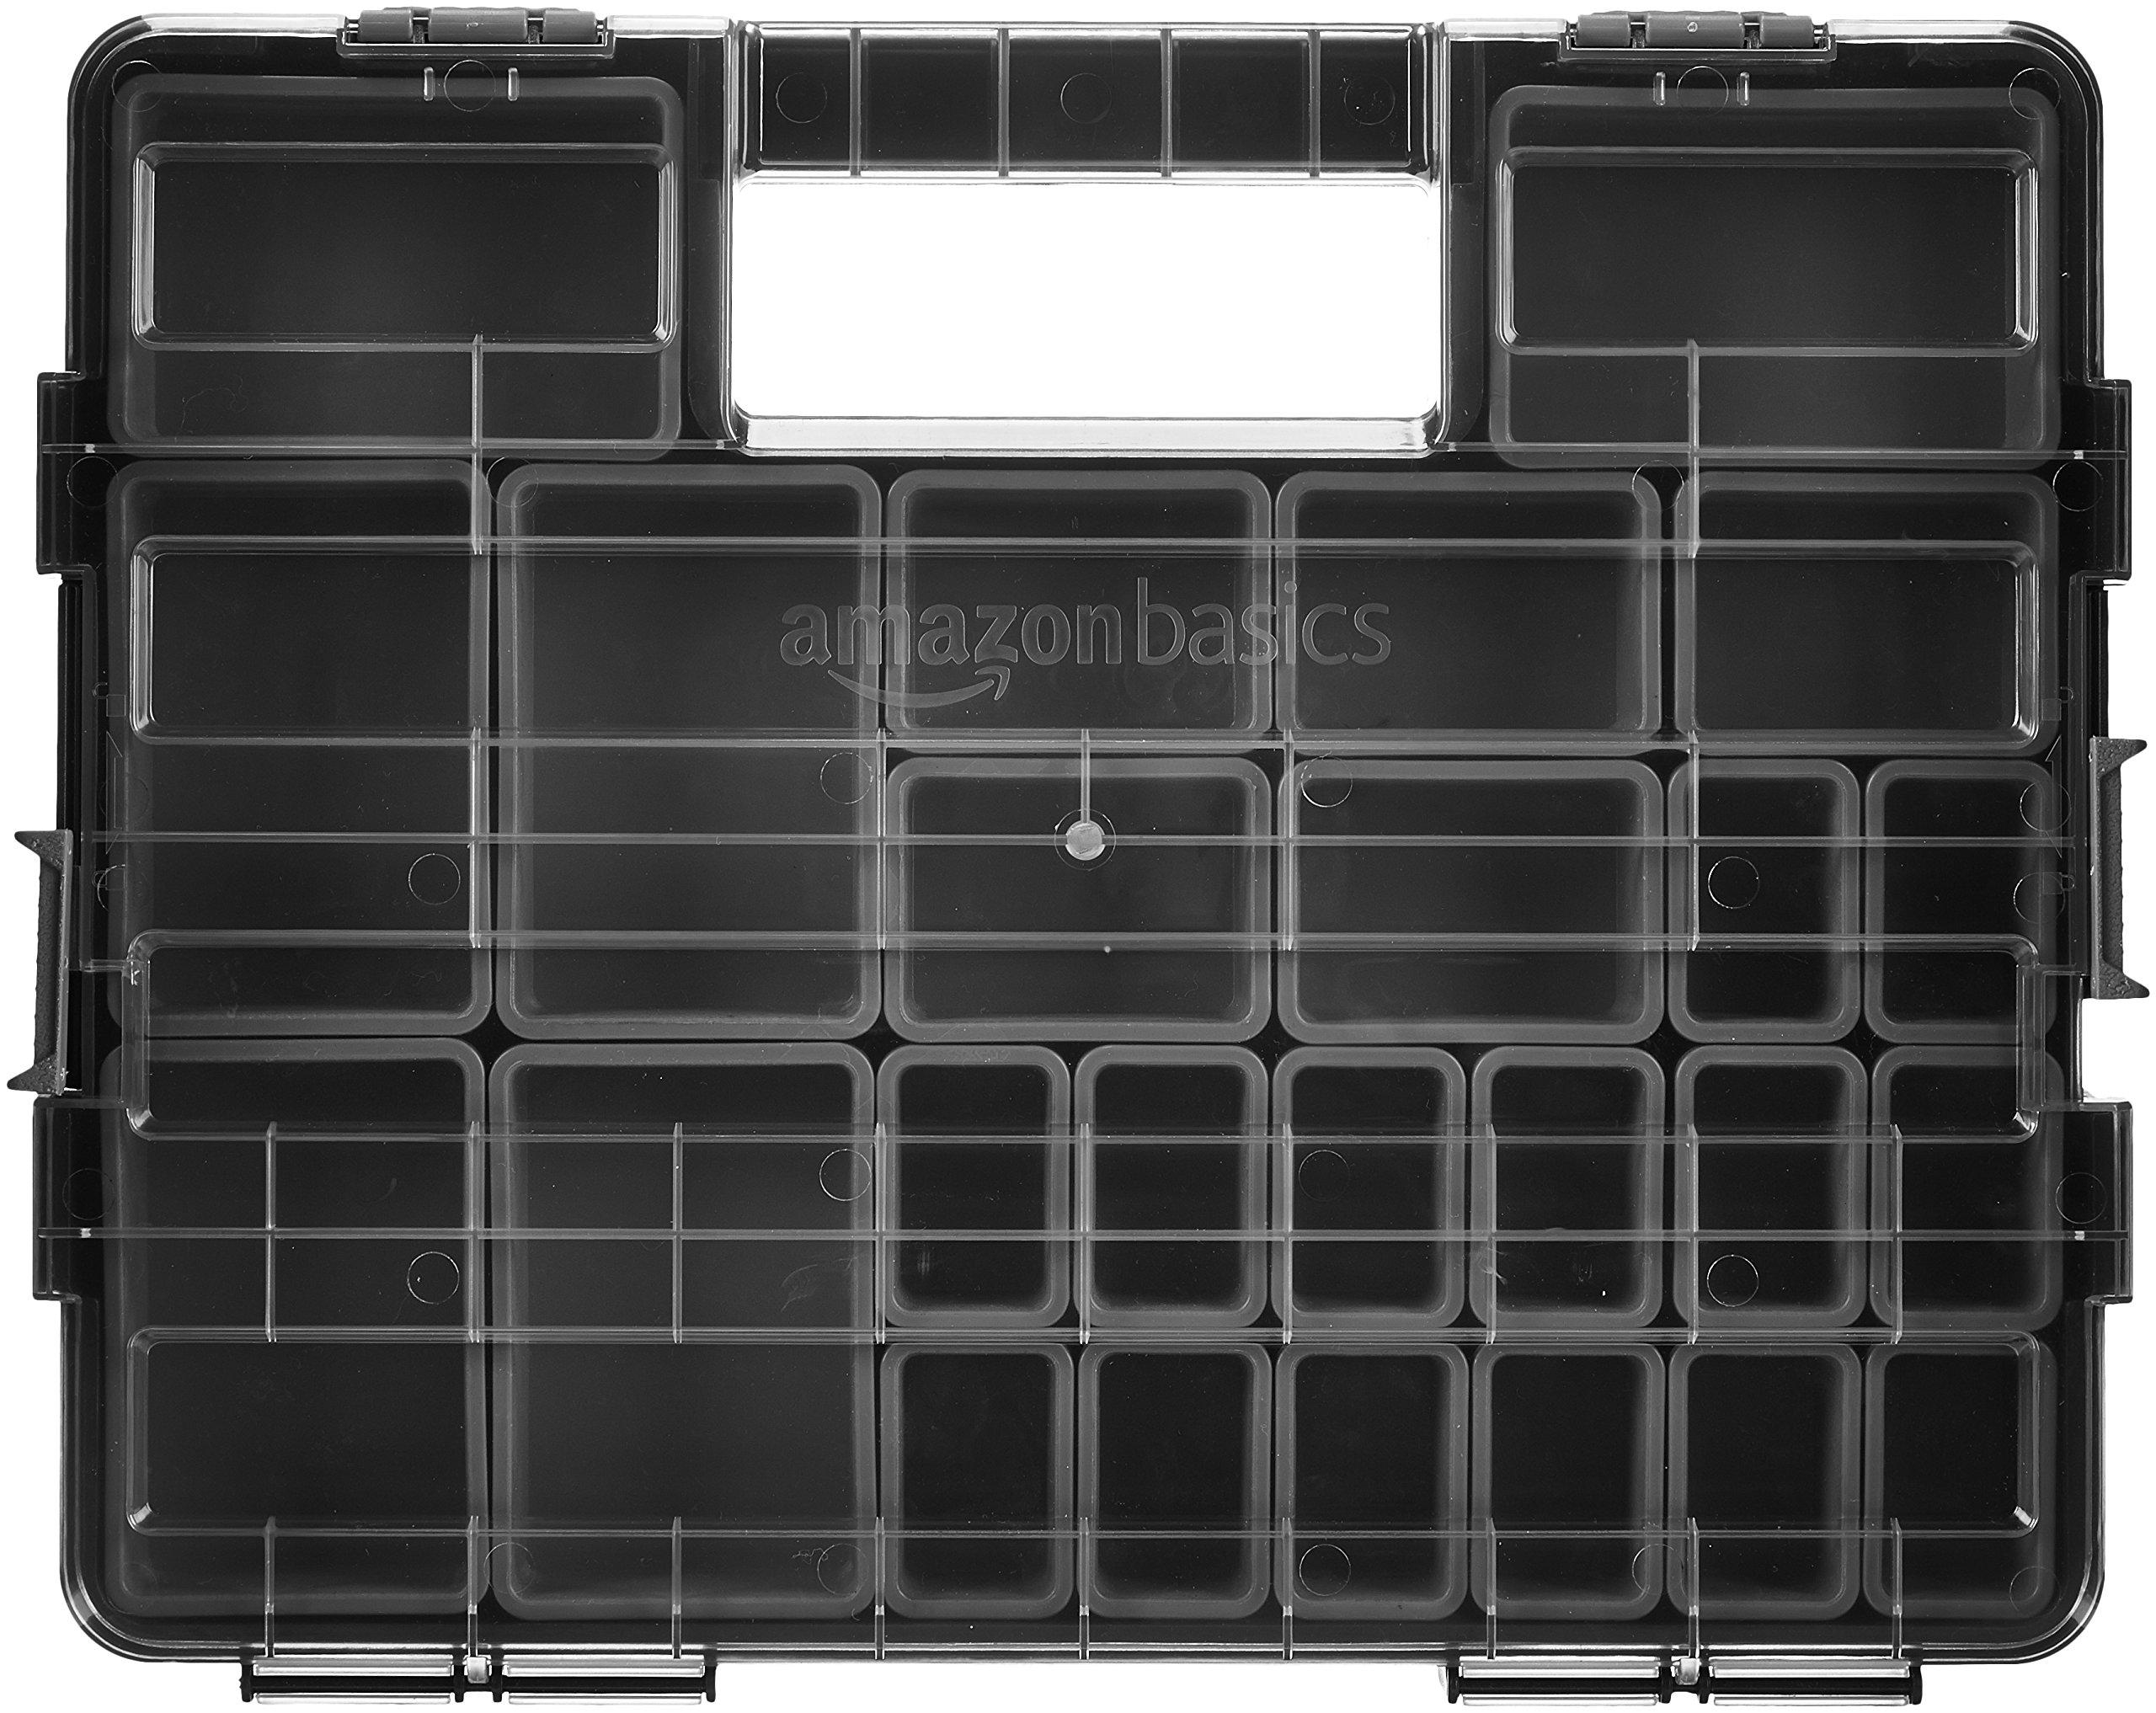 AmazonBasics Tool Organizer - 25 Compartments